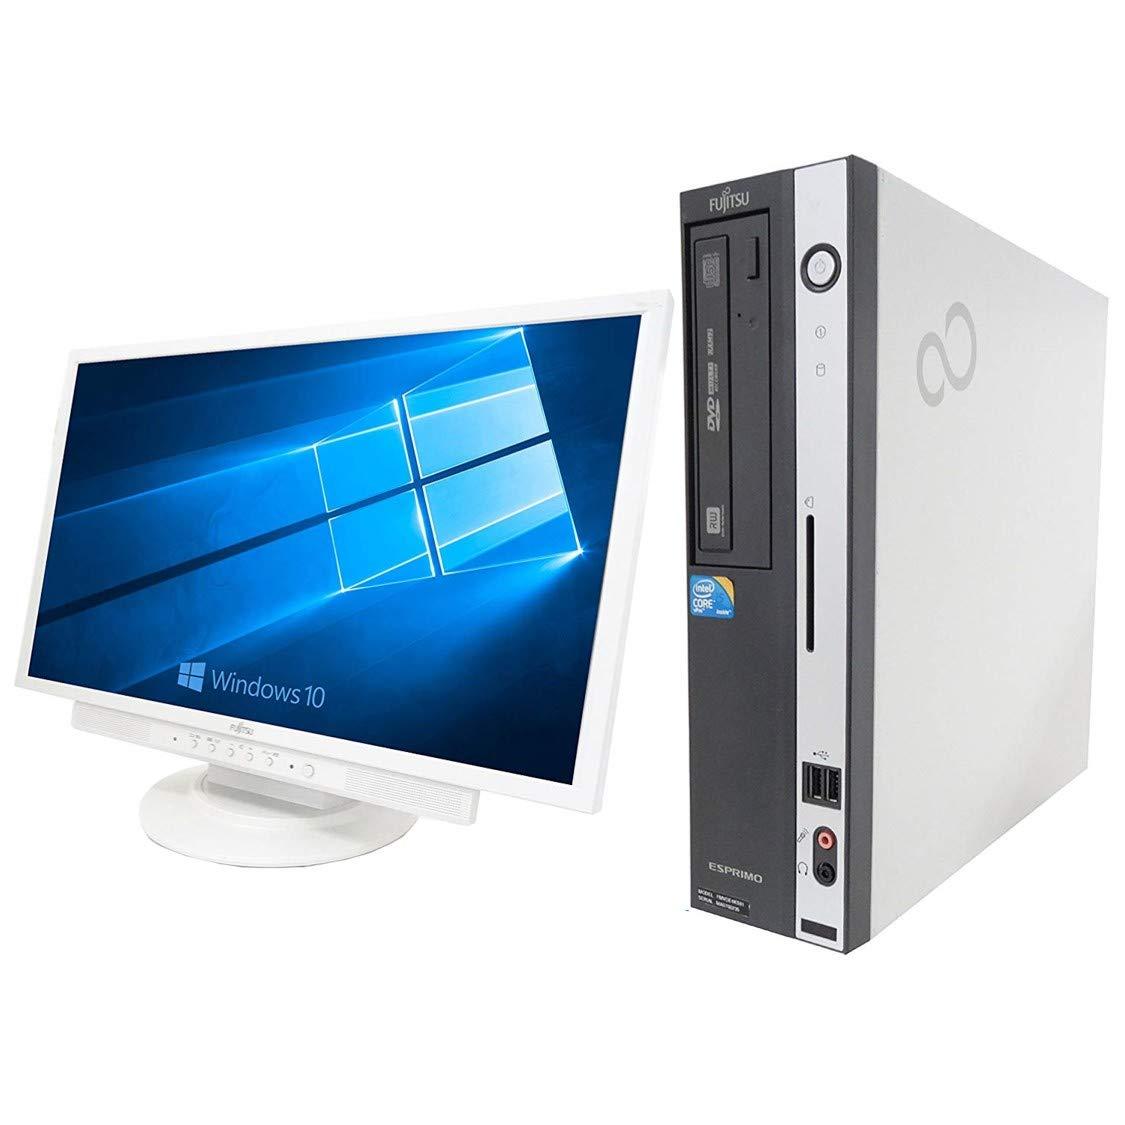 【Microsoft Office 2010搭載】【Win 10搭載】【超大画面22インチ液晶セット】富士通 D750/A/新世代Core i5 3.2GHz/メモリ4GB/HDD500GB/DVDスーパーマルチ/中古デスクトップパソコン B01M2YNIQG   Win 10搭載